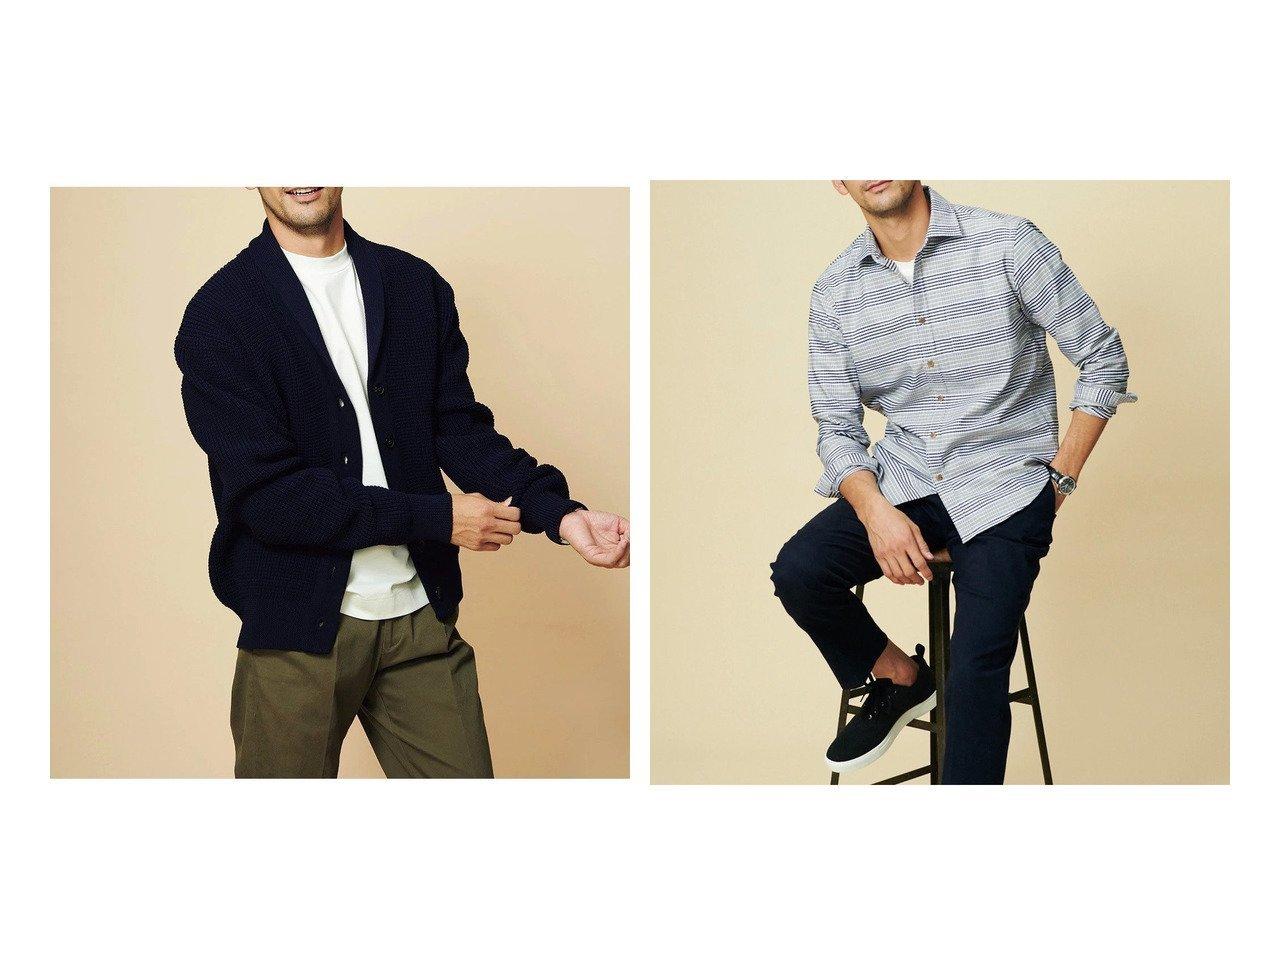 【DoCLASSE / MEN/ドゥクラッセ】のワッフル編ショールカーデ&ピュアファインシャツ長袖レギュラー襟/トールサイズ 【MEN】ドゥクラッセの40代、50代の男性におすすめ!人気トレンド・メンズファッションの通販 おすすめで人気の流行・トレンド、ファッションの通販商品 メンズファッション・キッズファッション・インテリア・家具・レディースファッション・服の通販 founy(ファニー) https://founy.com/ ファッション Fashion メンズファッション MEN ワッフル 洗える 軽量 ストレッチ ドレス プレミアム レギュラー ワーク 抗菌 長袖 |ID:crp329100000021651